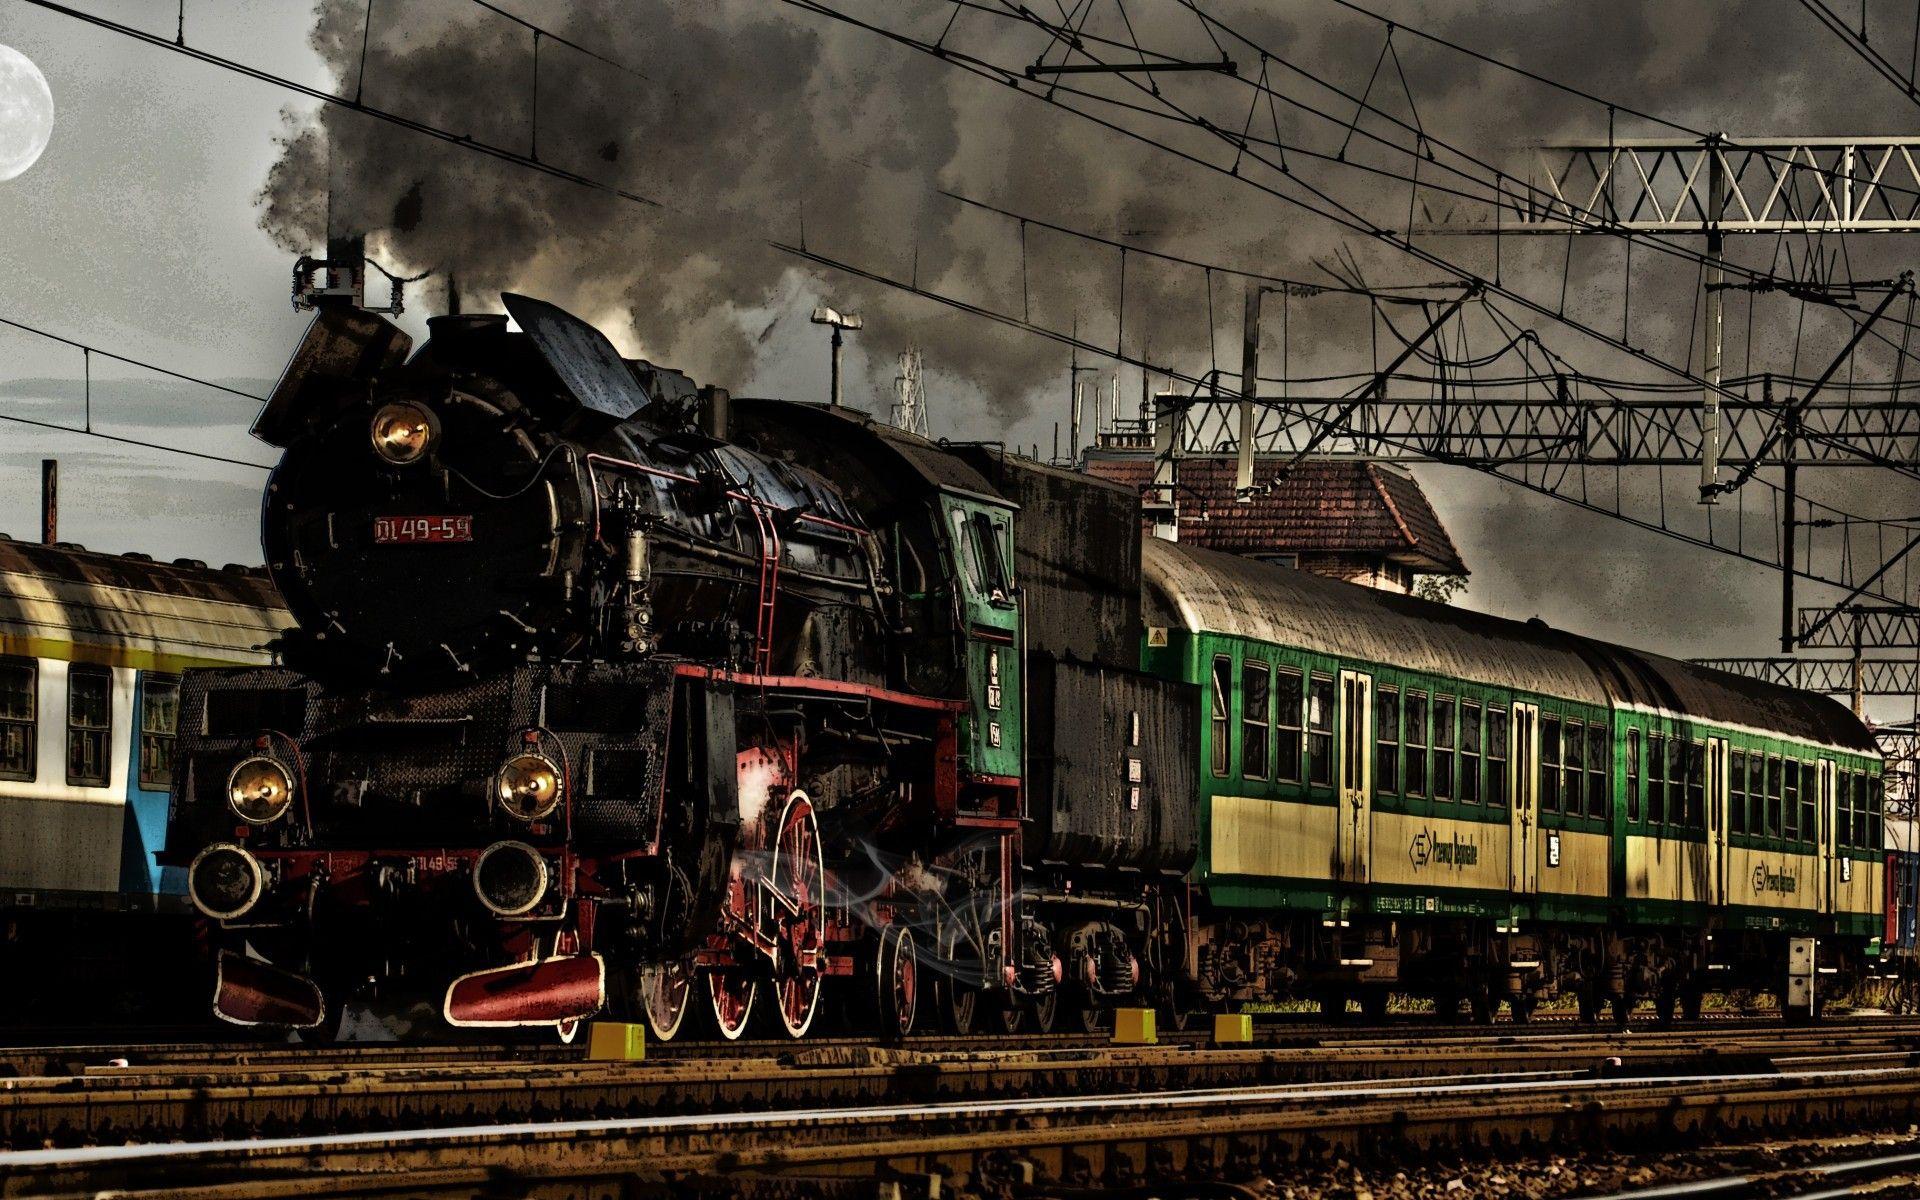 Hd wallpaper editor - 5416257 Steam Train Hd Wallpapers Jpg 1920 1200